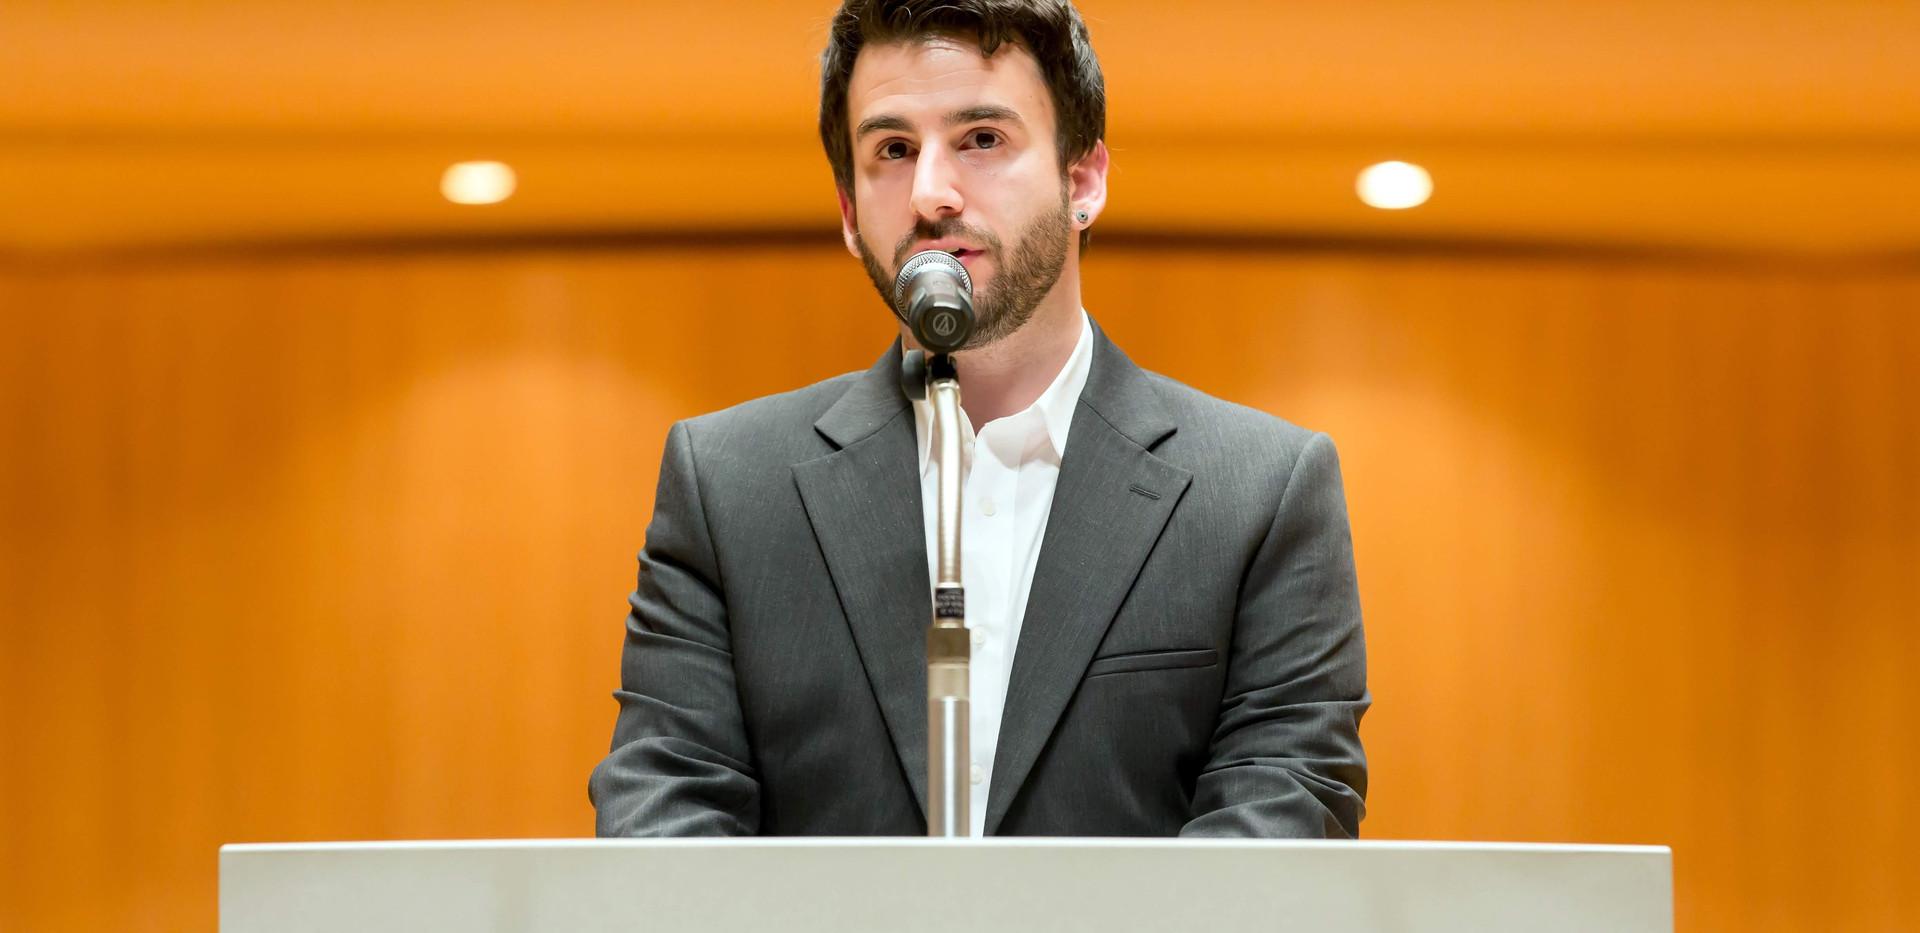 Selterneich - Award Acceptance Speech at Takemitsu Composition Award